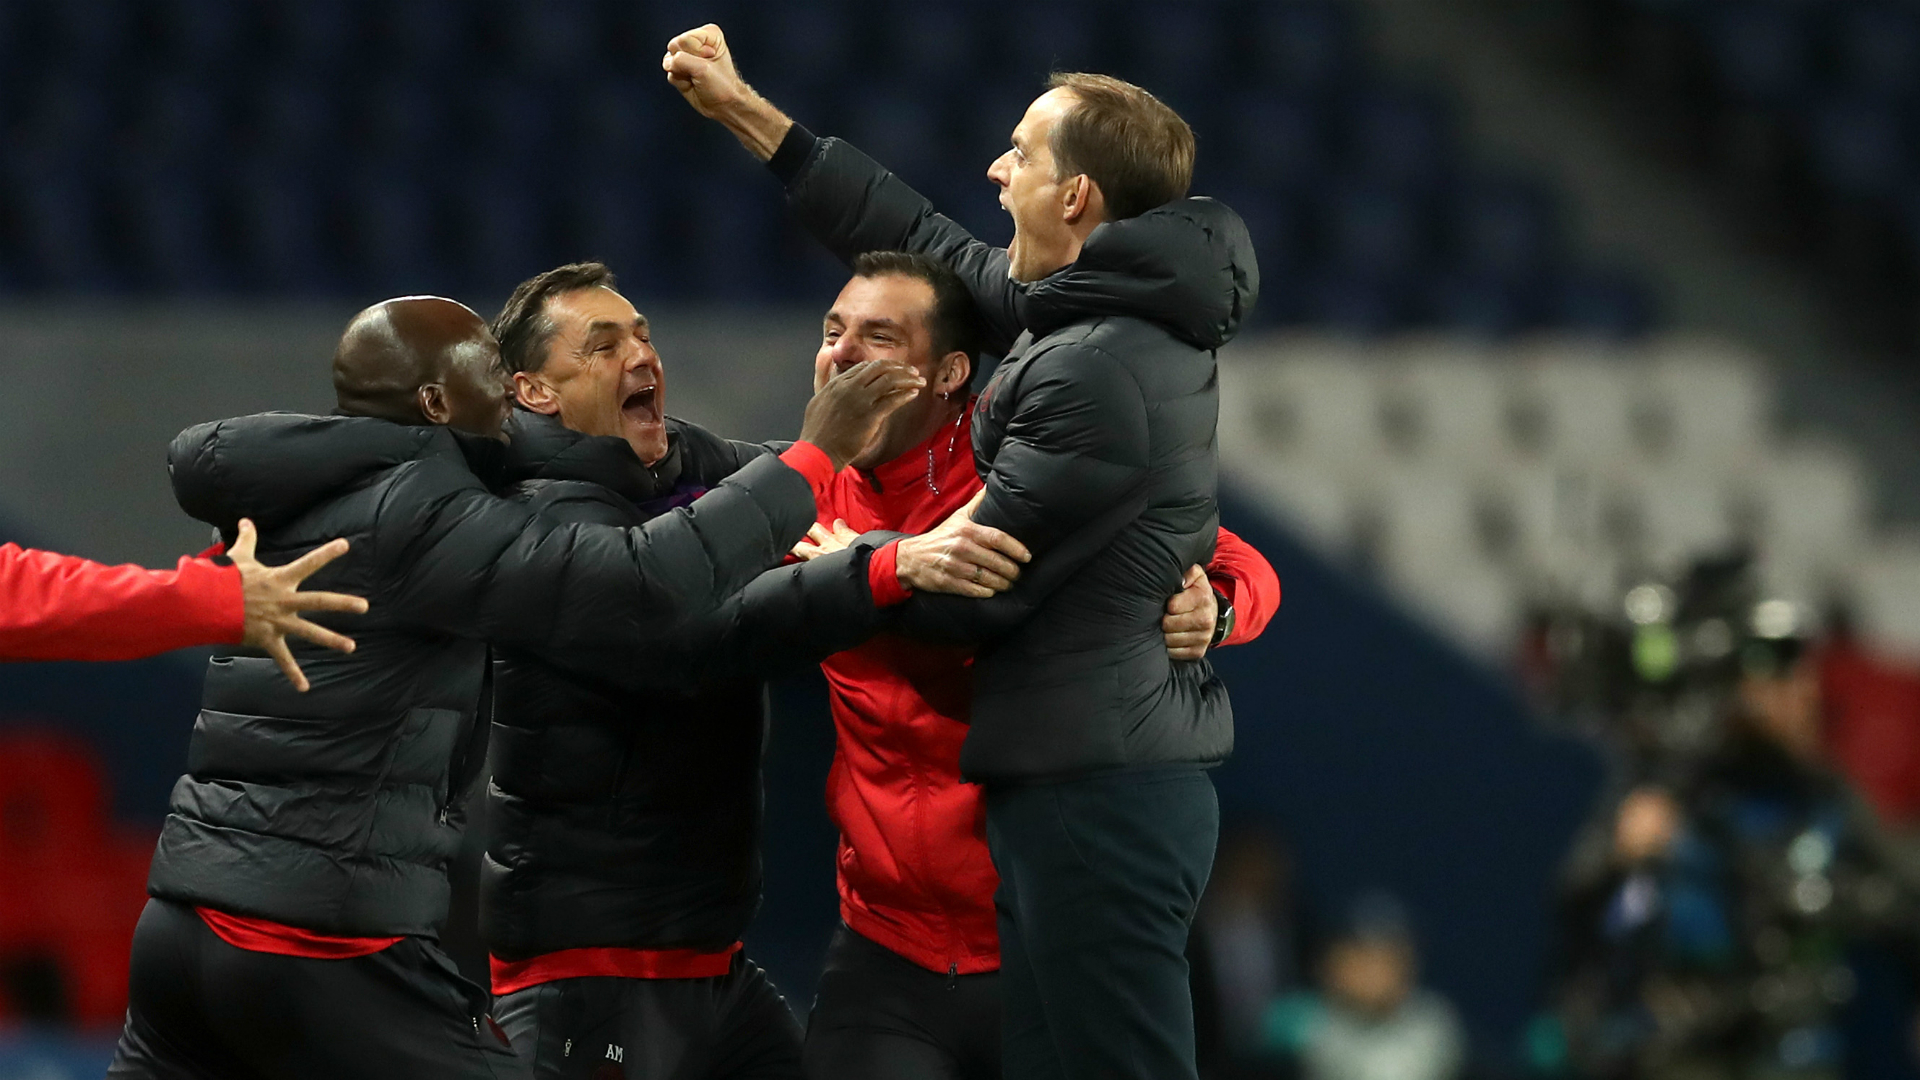 Tuchel celebrates as PSG return to Champions League quarter-finals